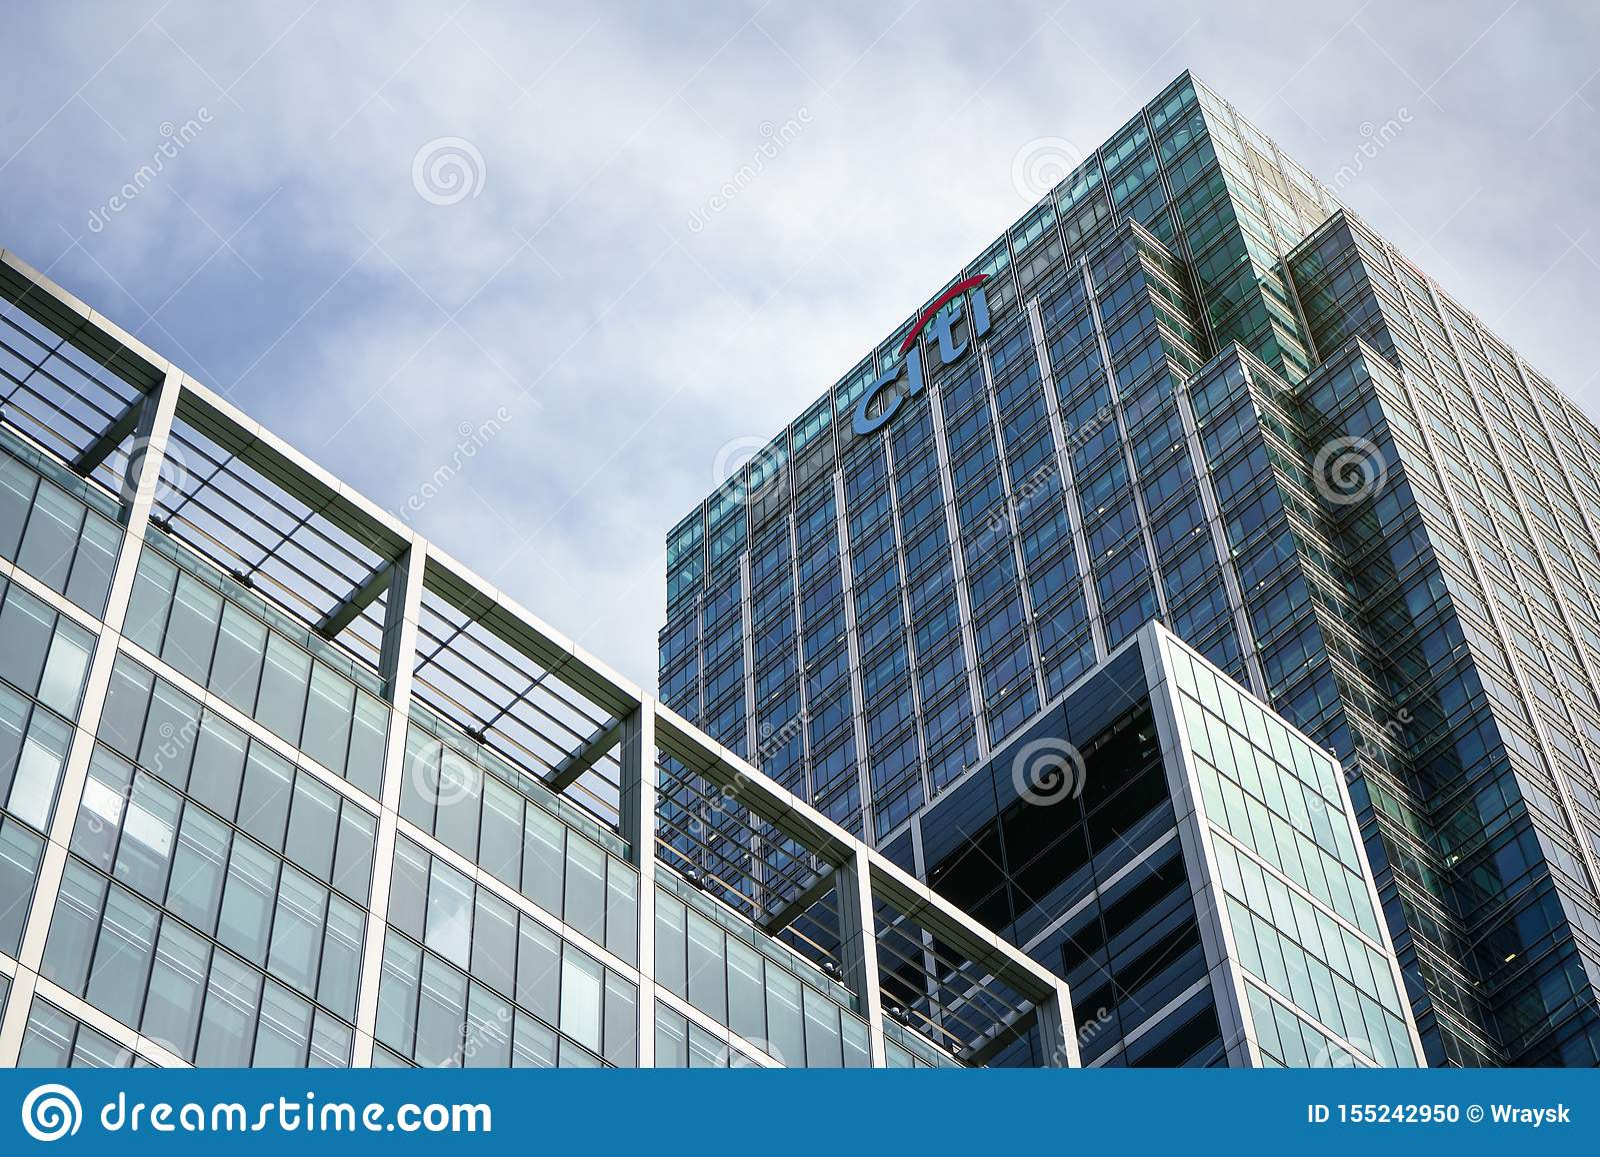 London, United Kingdom - February 03, 2019: Sun shines on Citi EMEA headquarters at Canary Wharf. Citibank Citigroup Inc. is